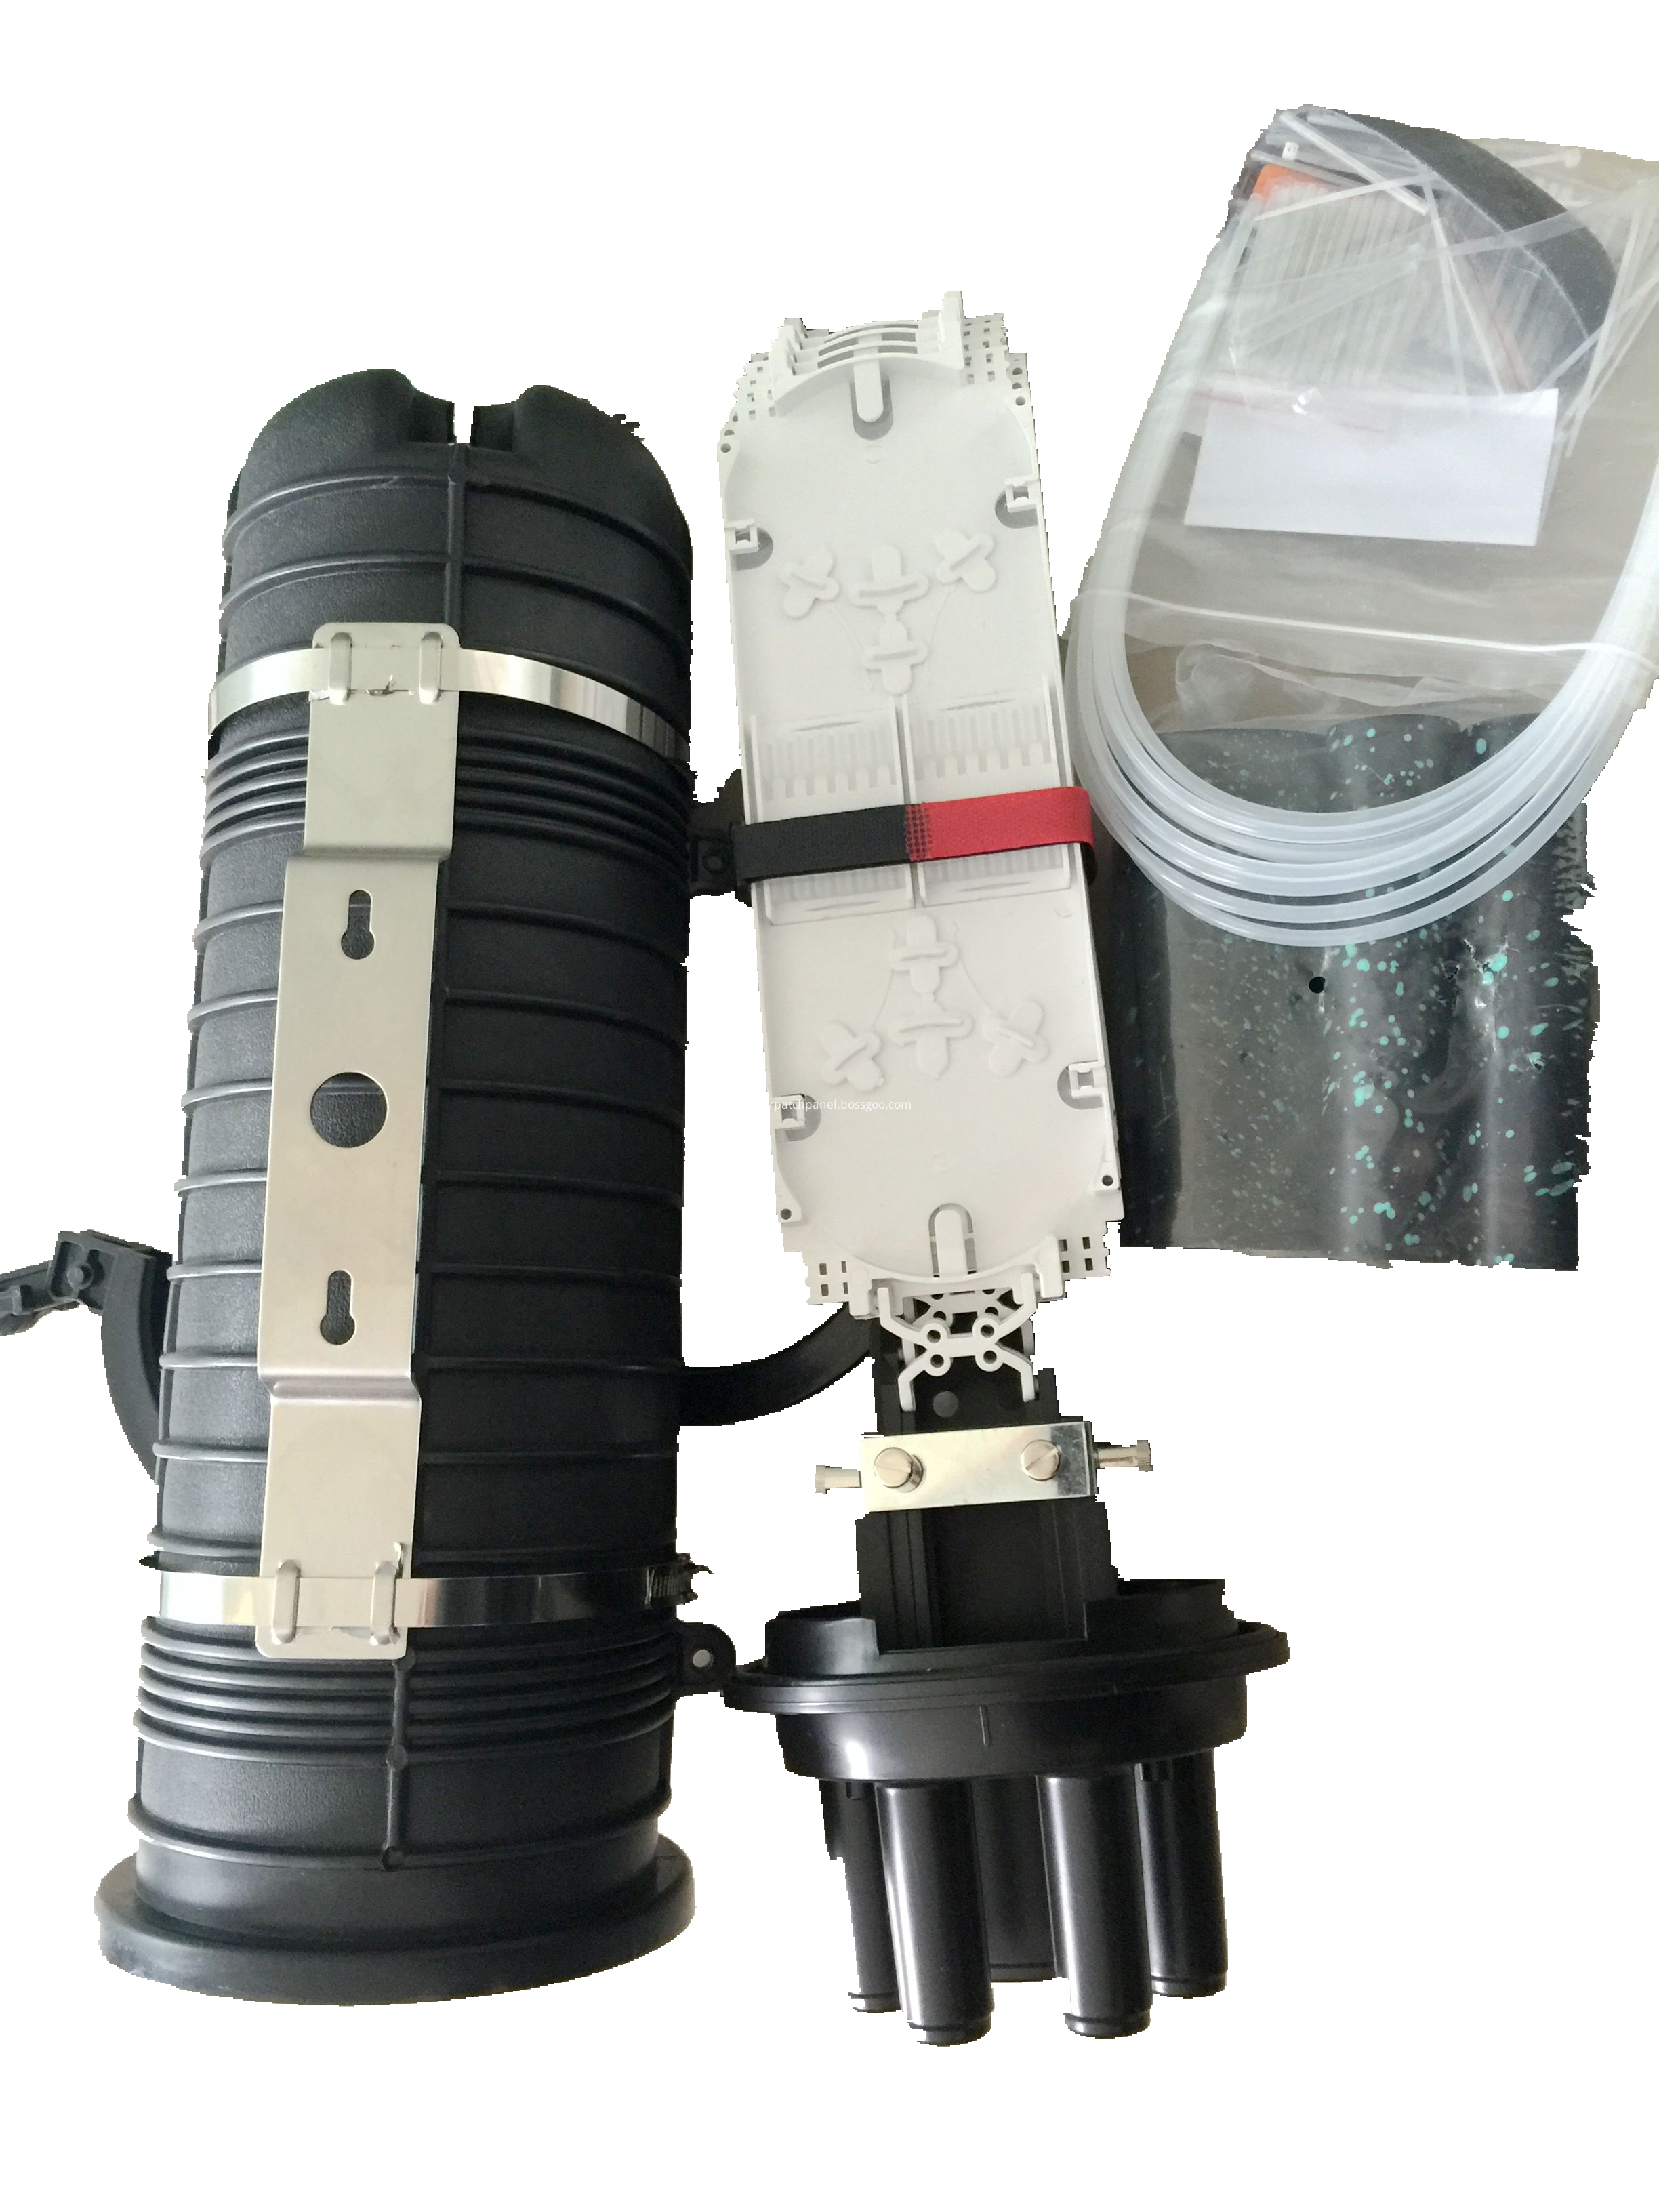 96cores fiber optic splice closure